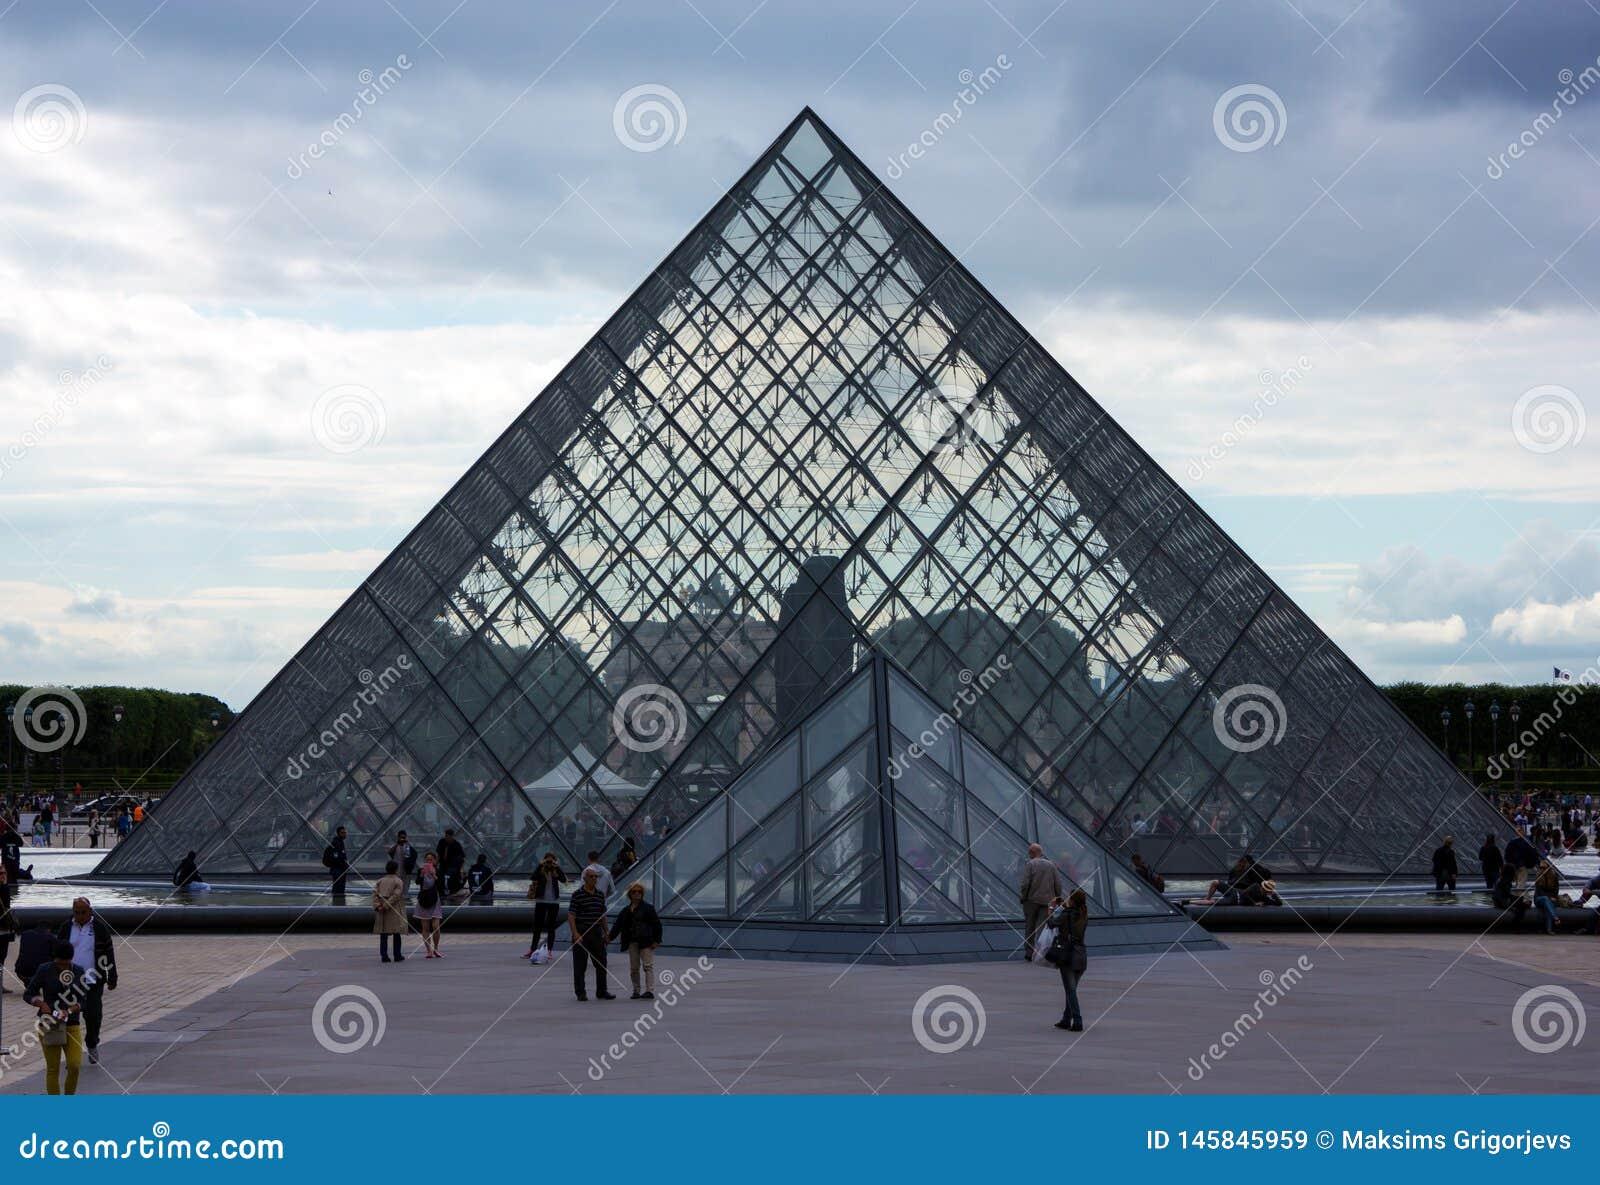 The Louvre pyramid museum in Paris, France, June 25, 2013.